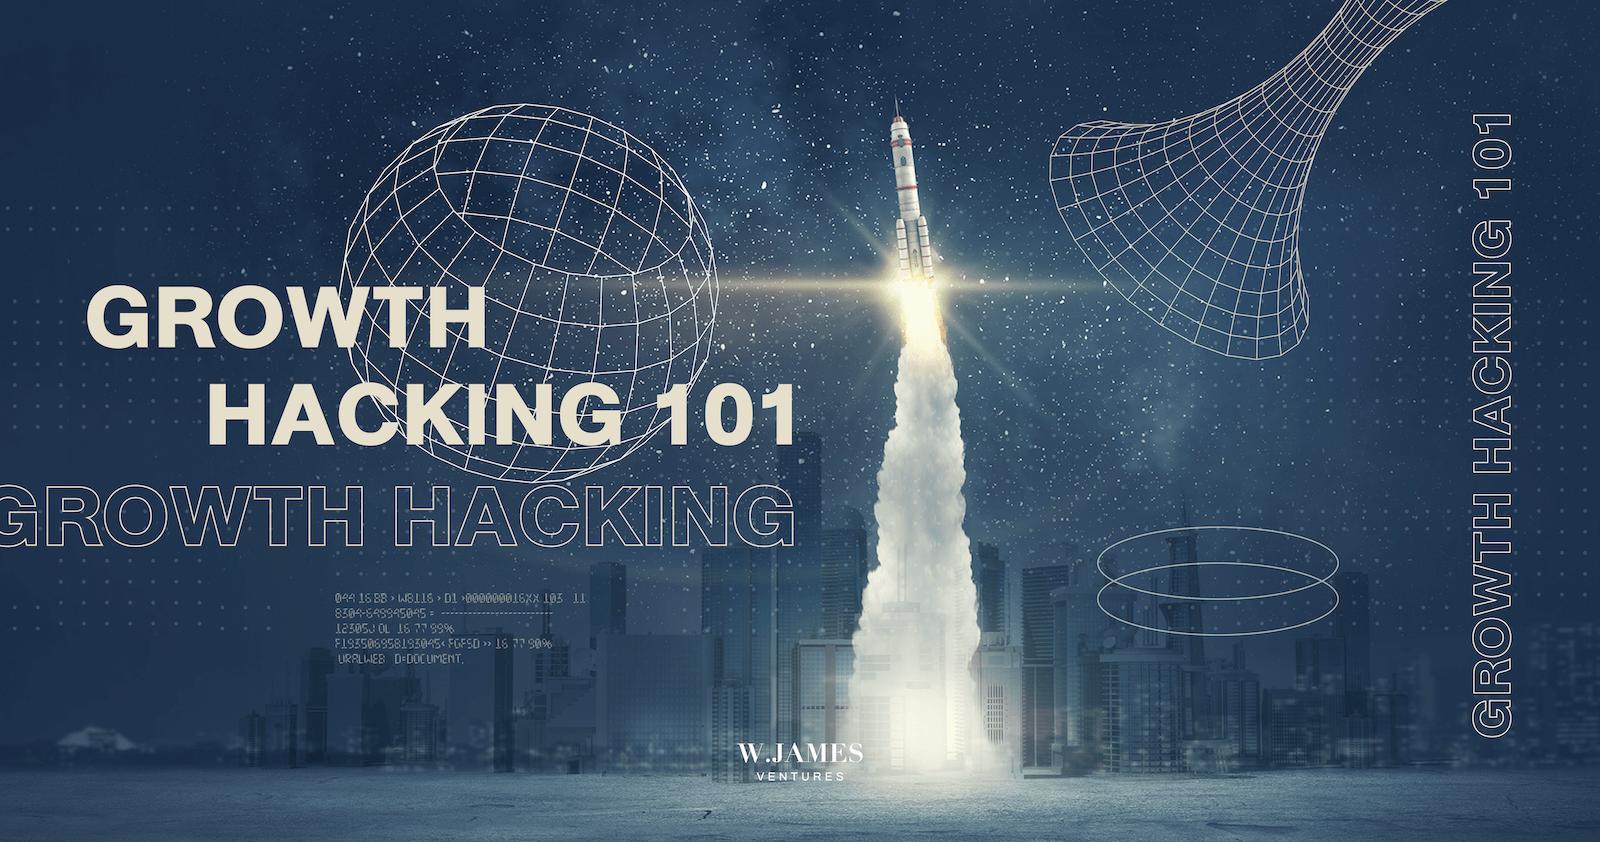 Growth Hacking คืออะไร : เบื้องหลังการสร้างธุรกิจให้โต 10 เท่า ฉบับปี 2021